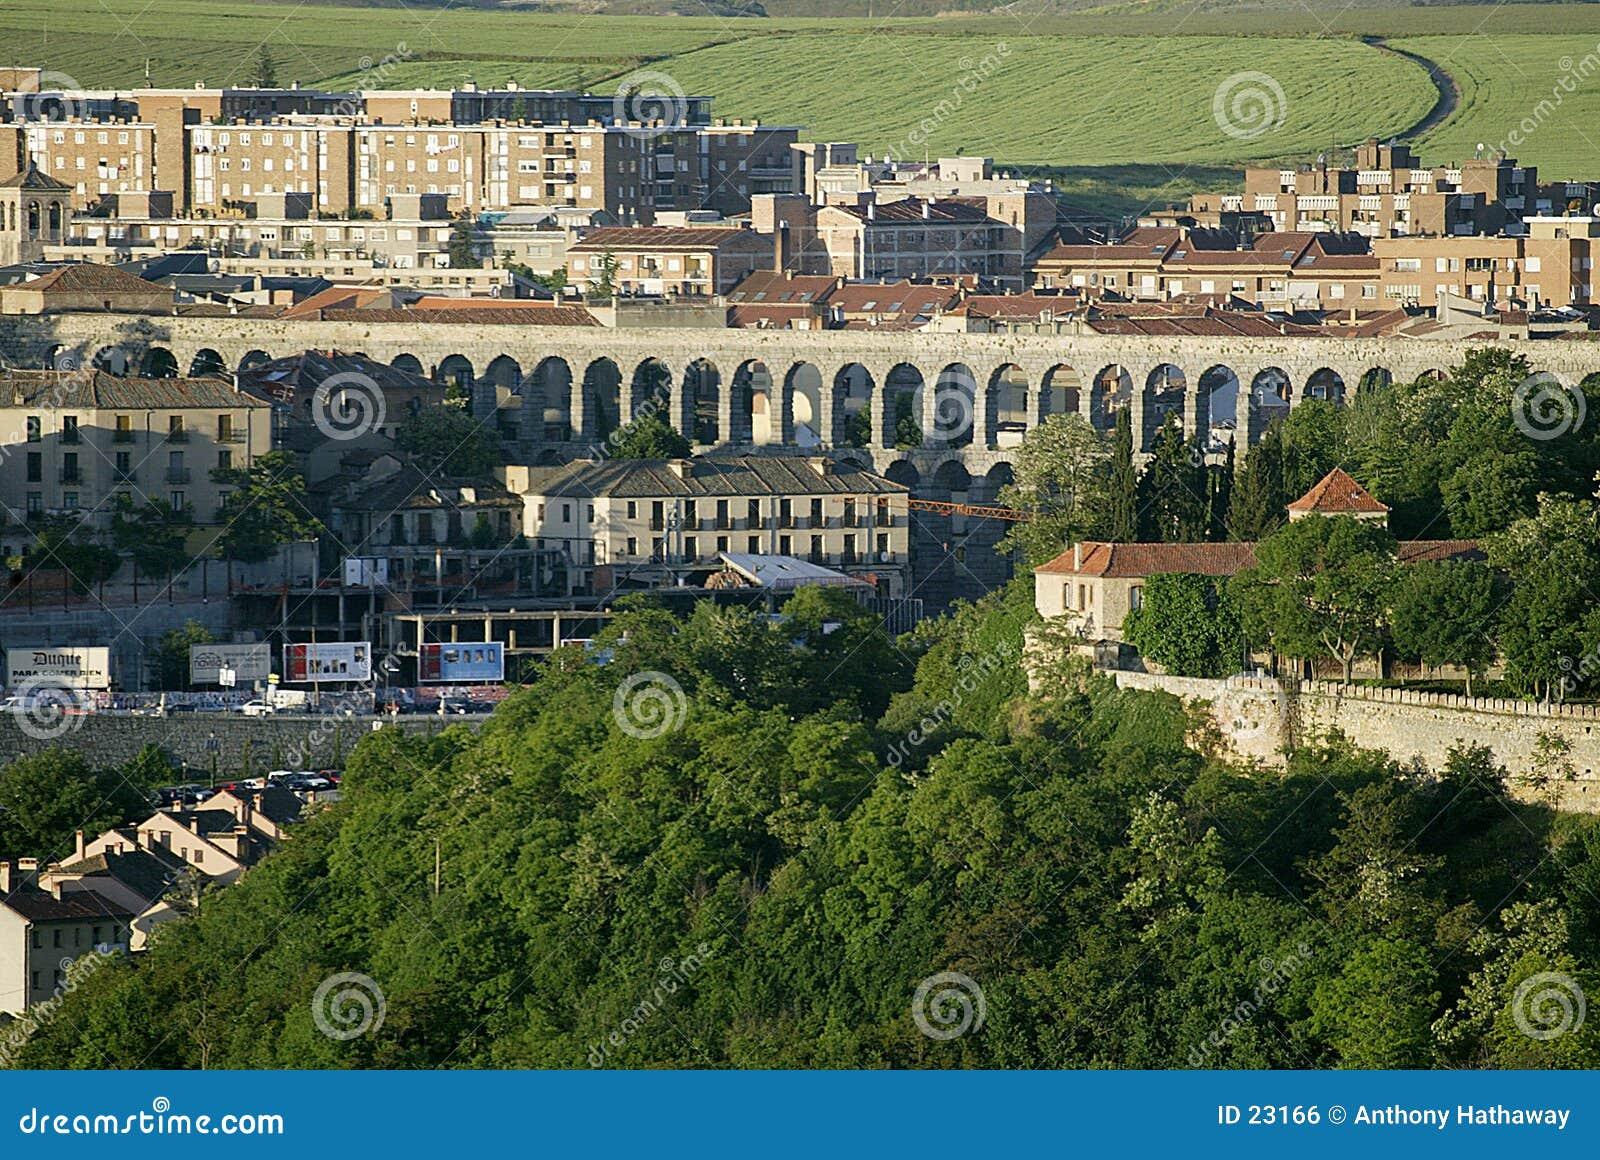 Aquaduct in Segovia, Spanje